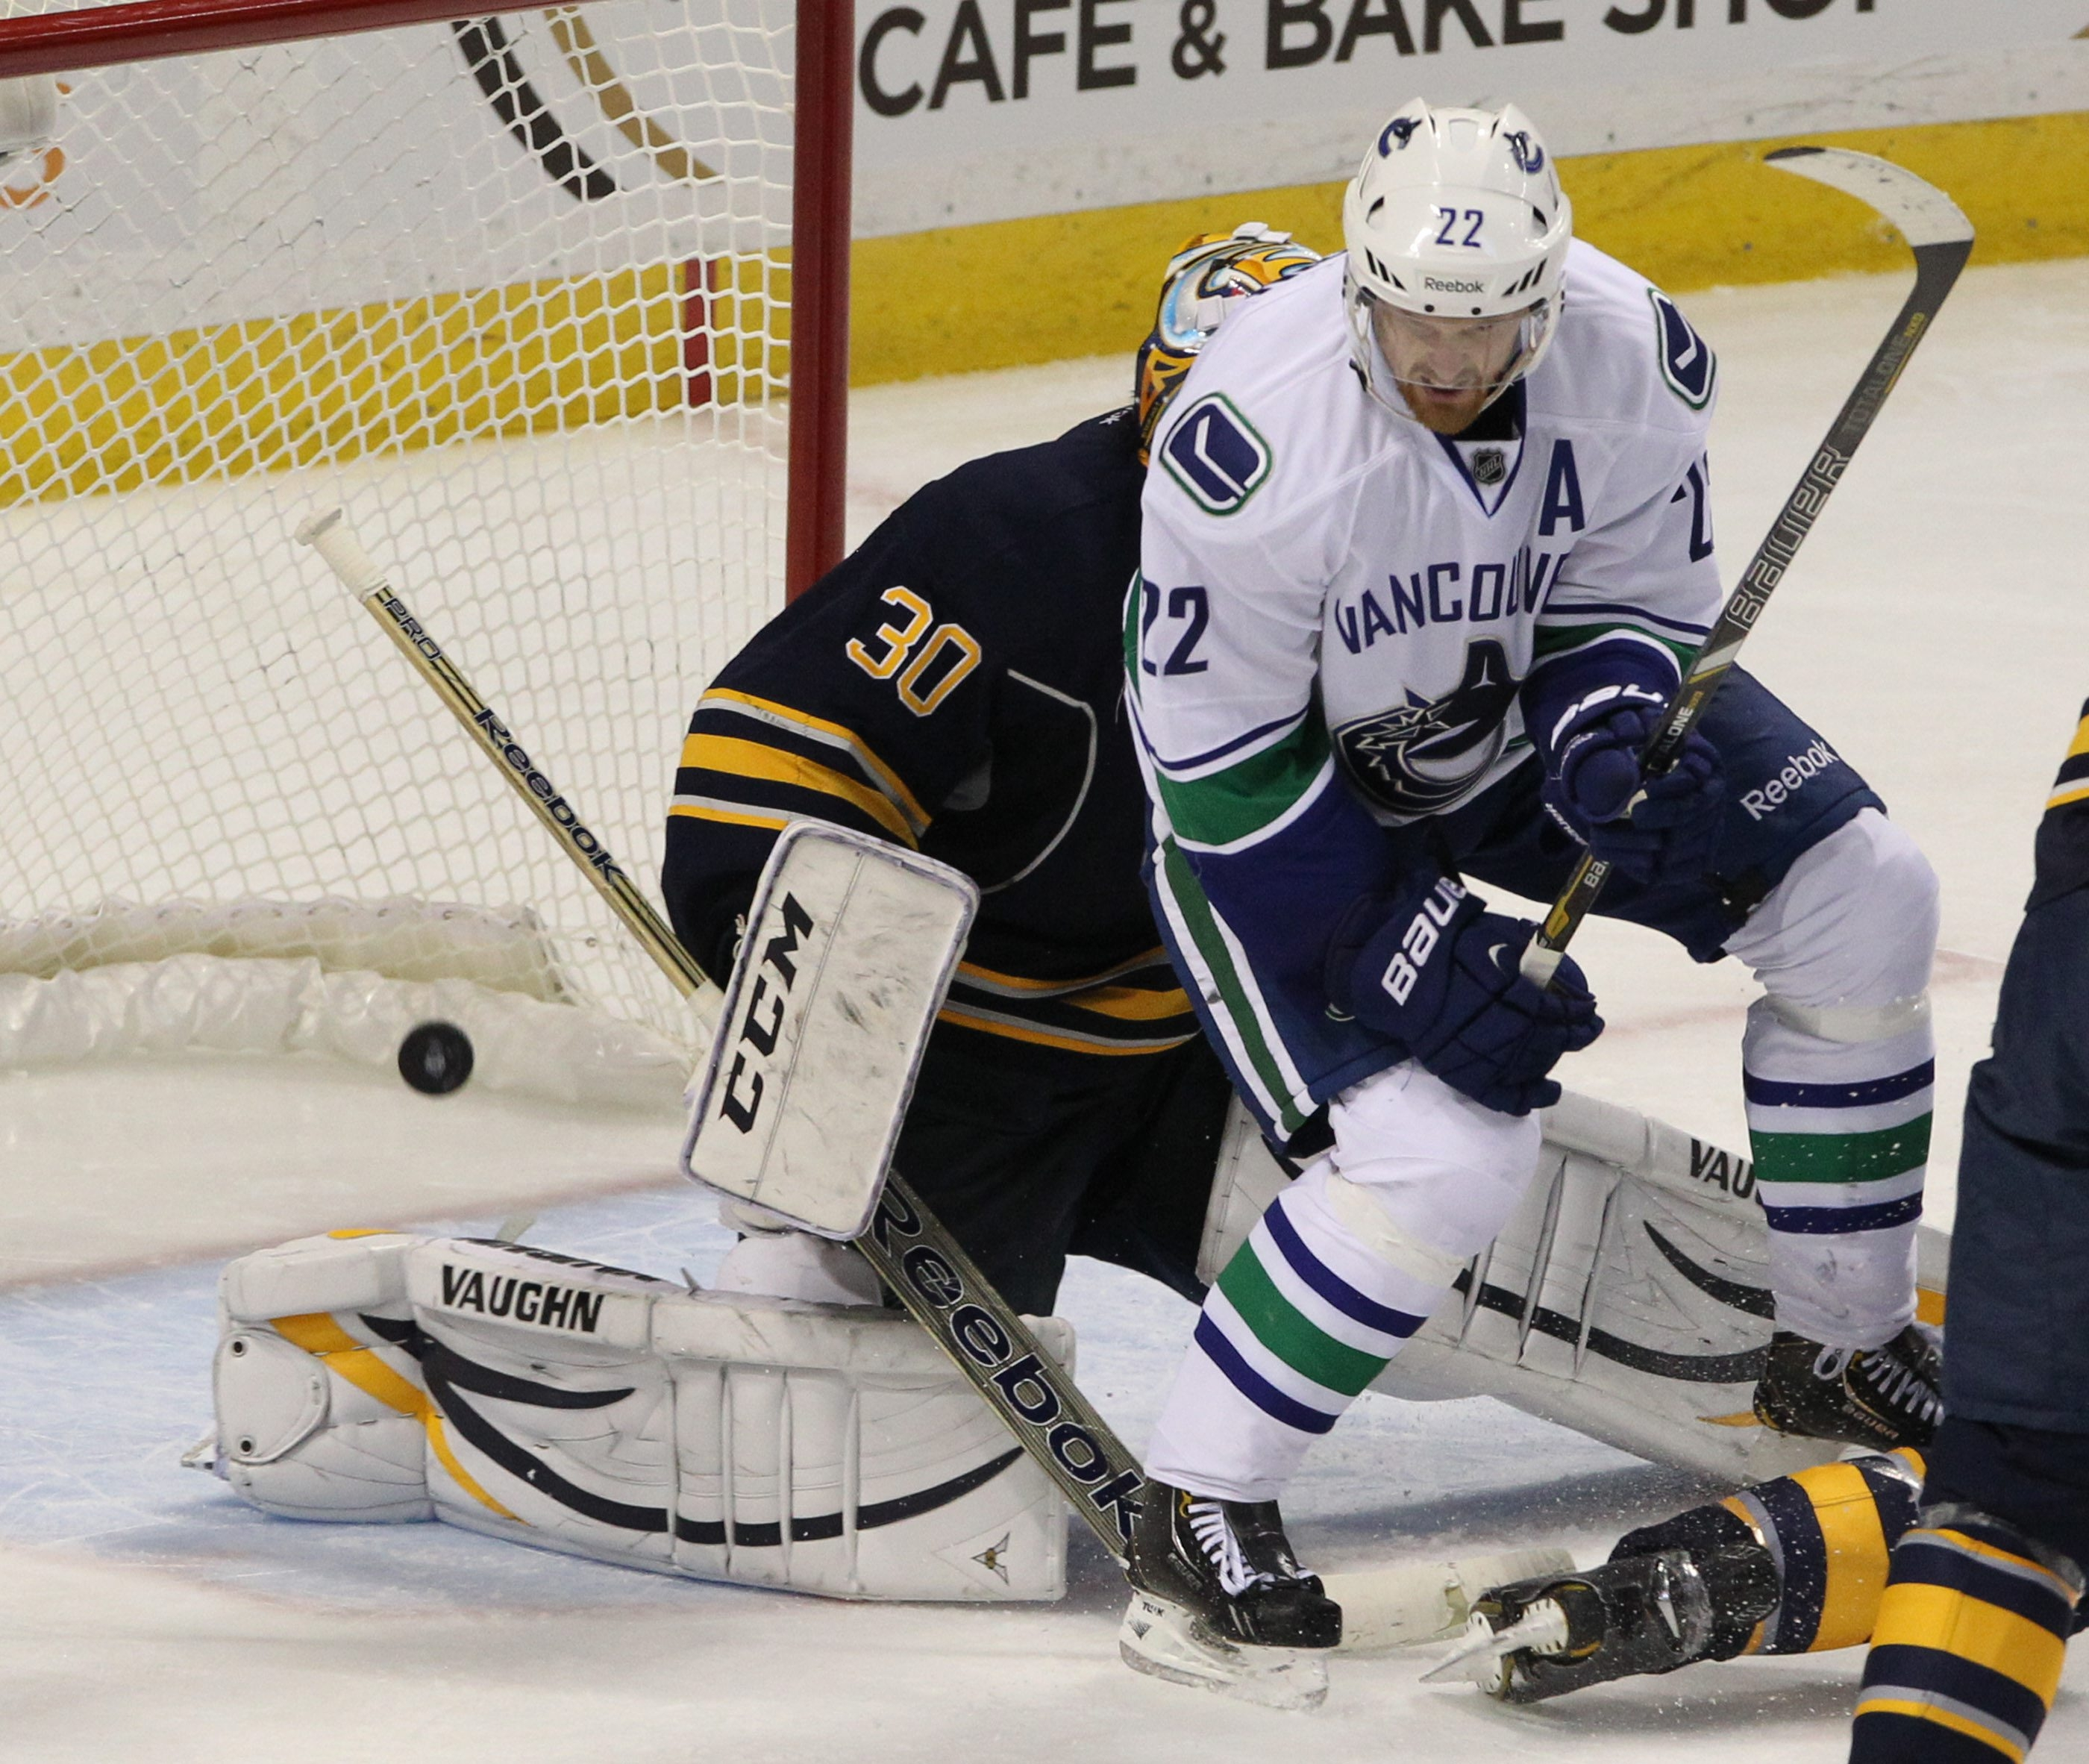 Canucks left wing Daniel Sedin (22) screens Sabres goalie Ryan Miller on Ryan Stanton's third-period goal, Vancouver's third of the game.